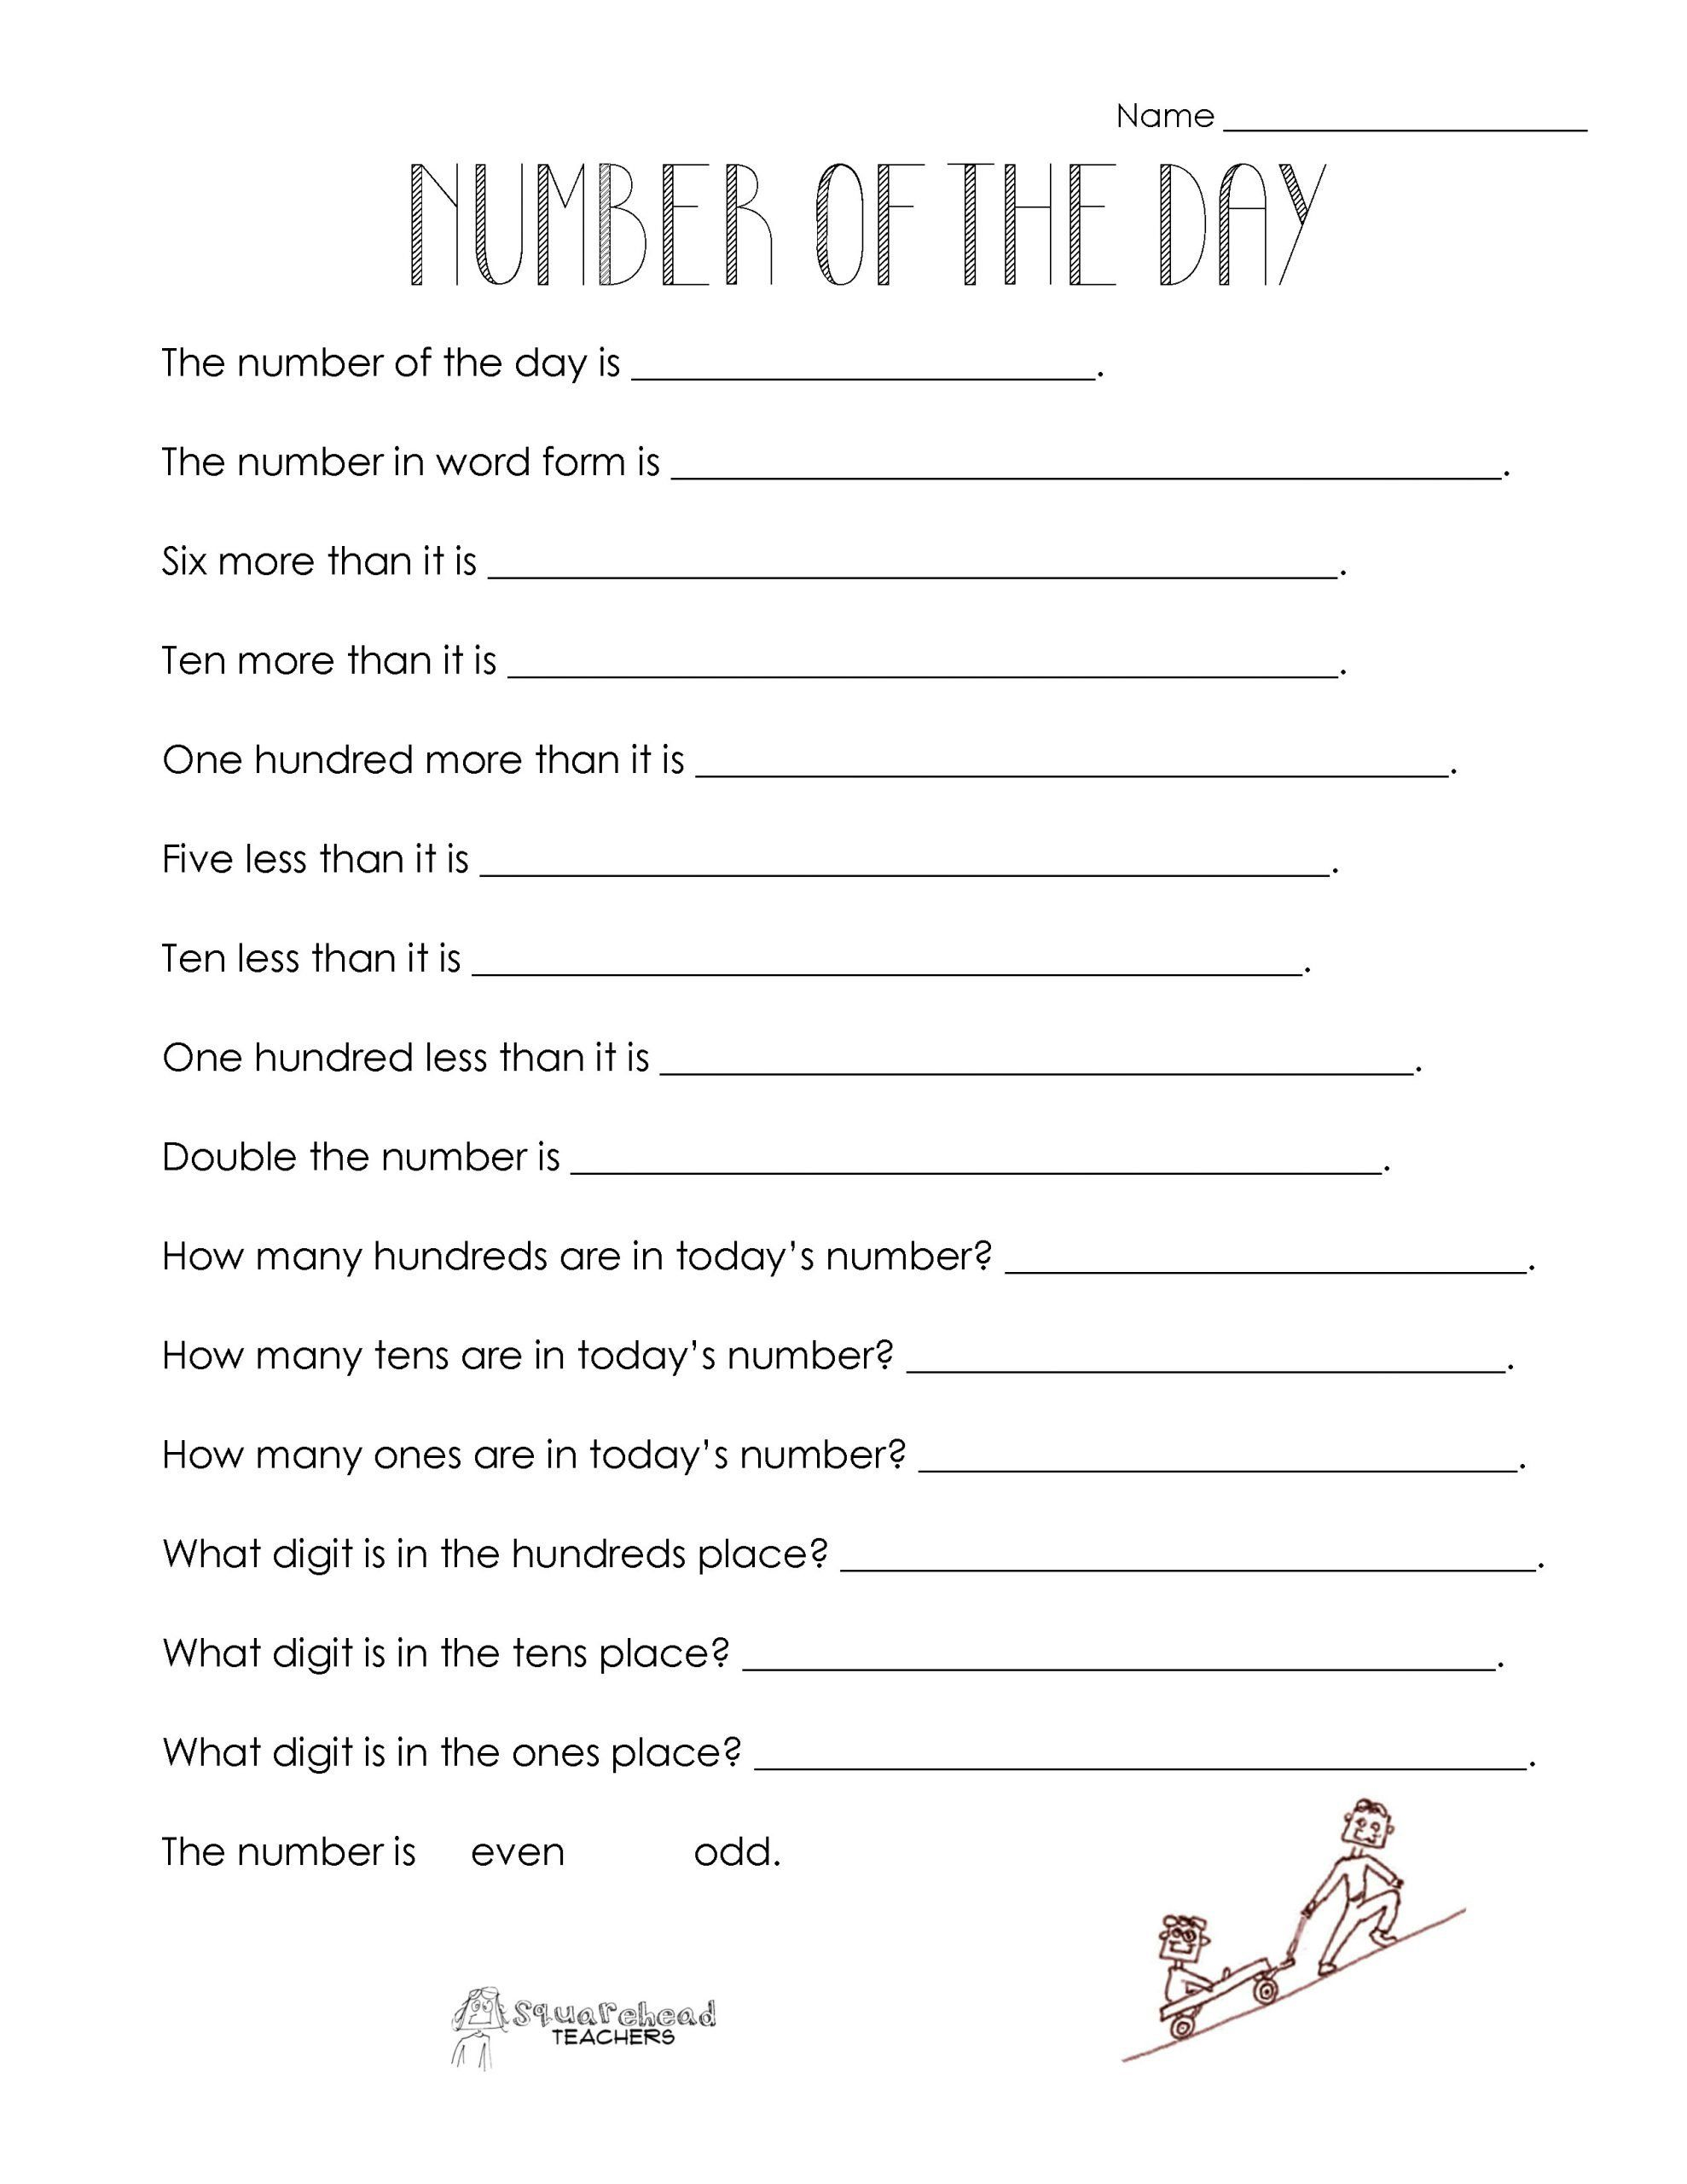 Sequencing Worksheet 2nd Grade Number Of The Day Worksheet